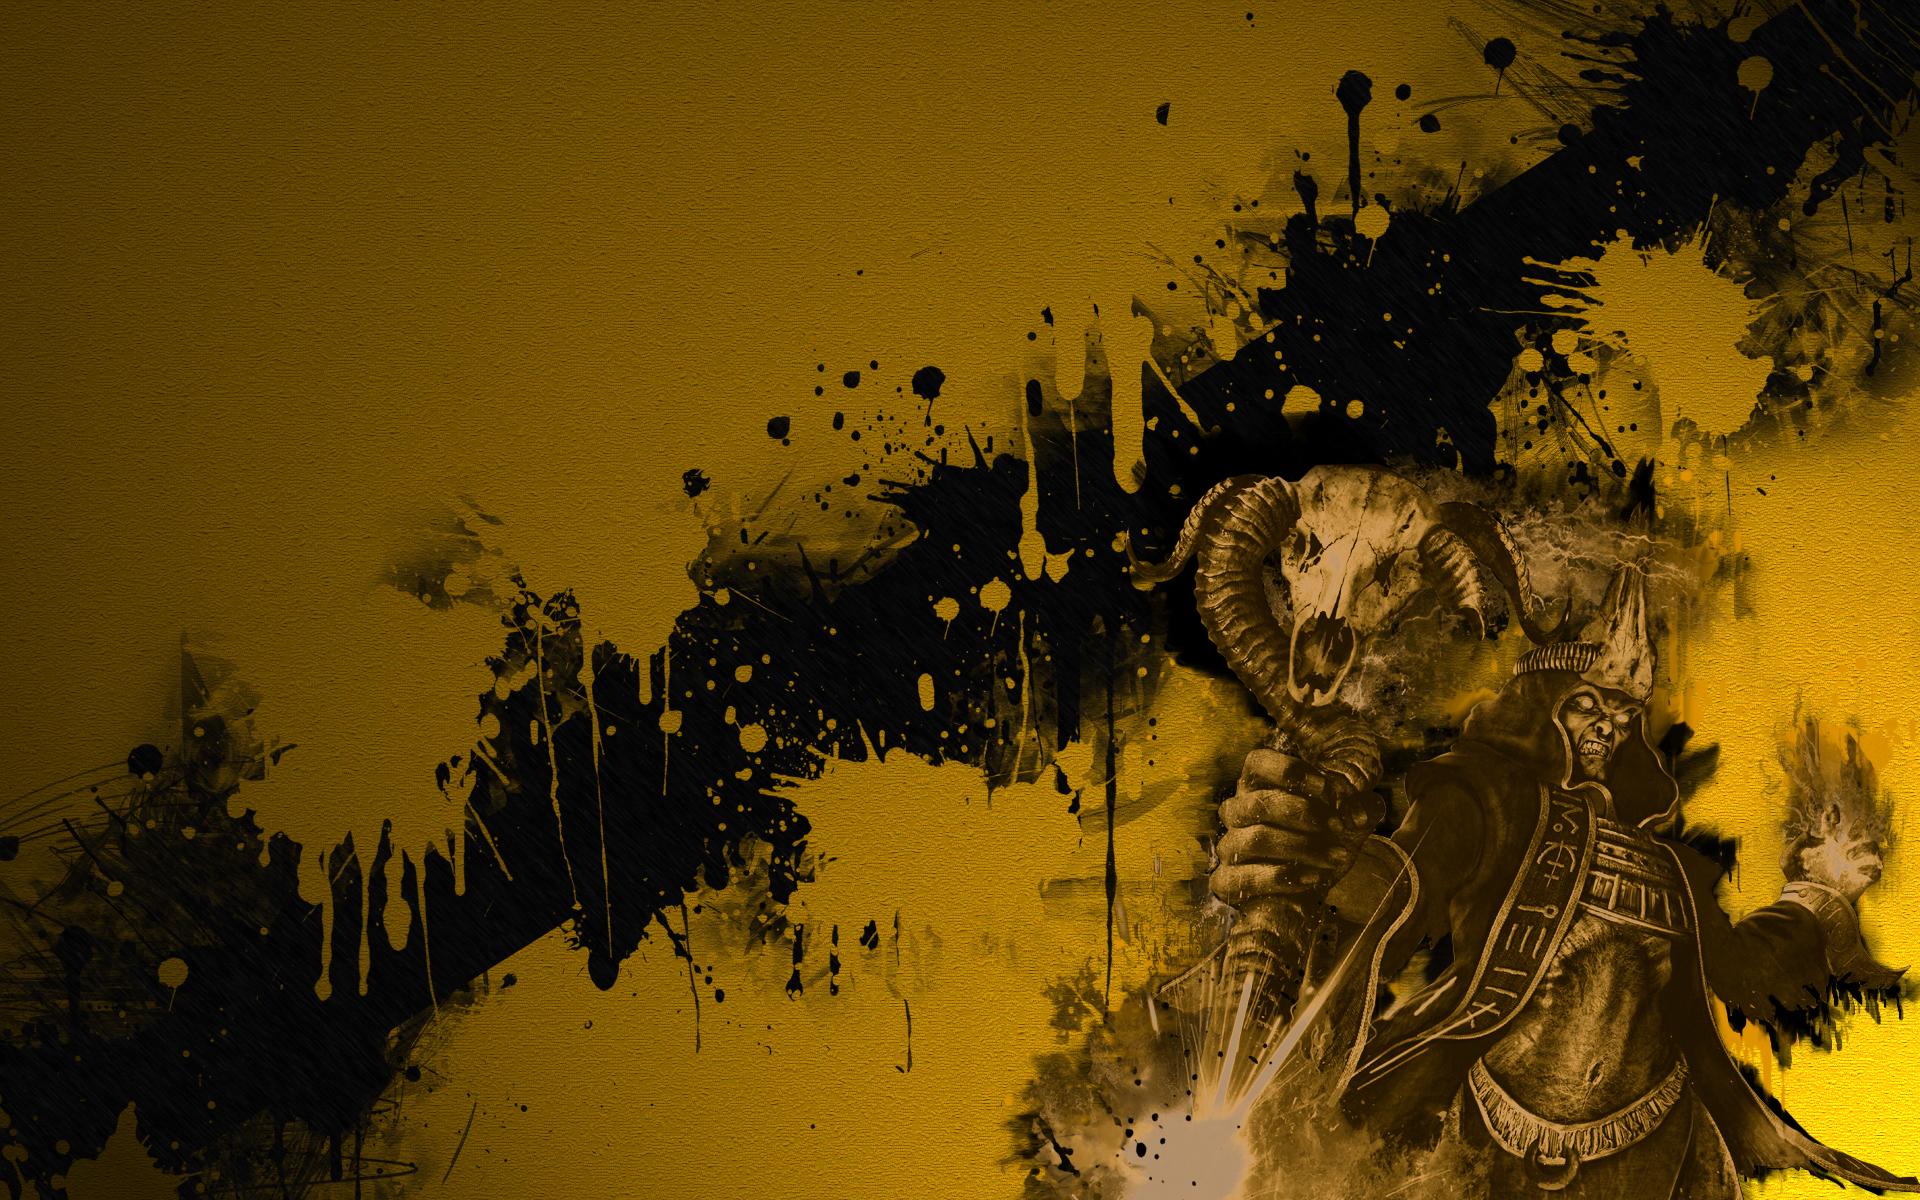 Dantes Inferno wallpaper   446448 1920x1200